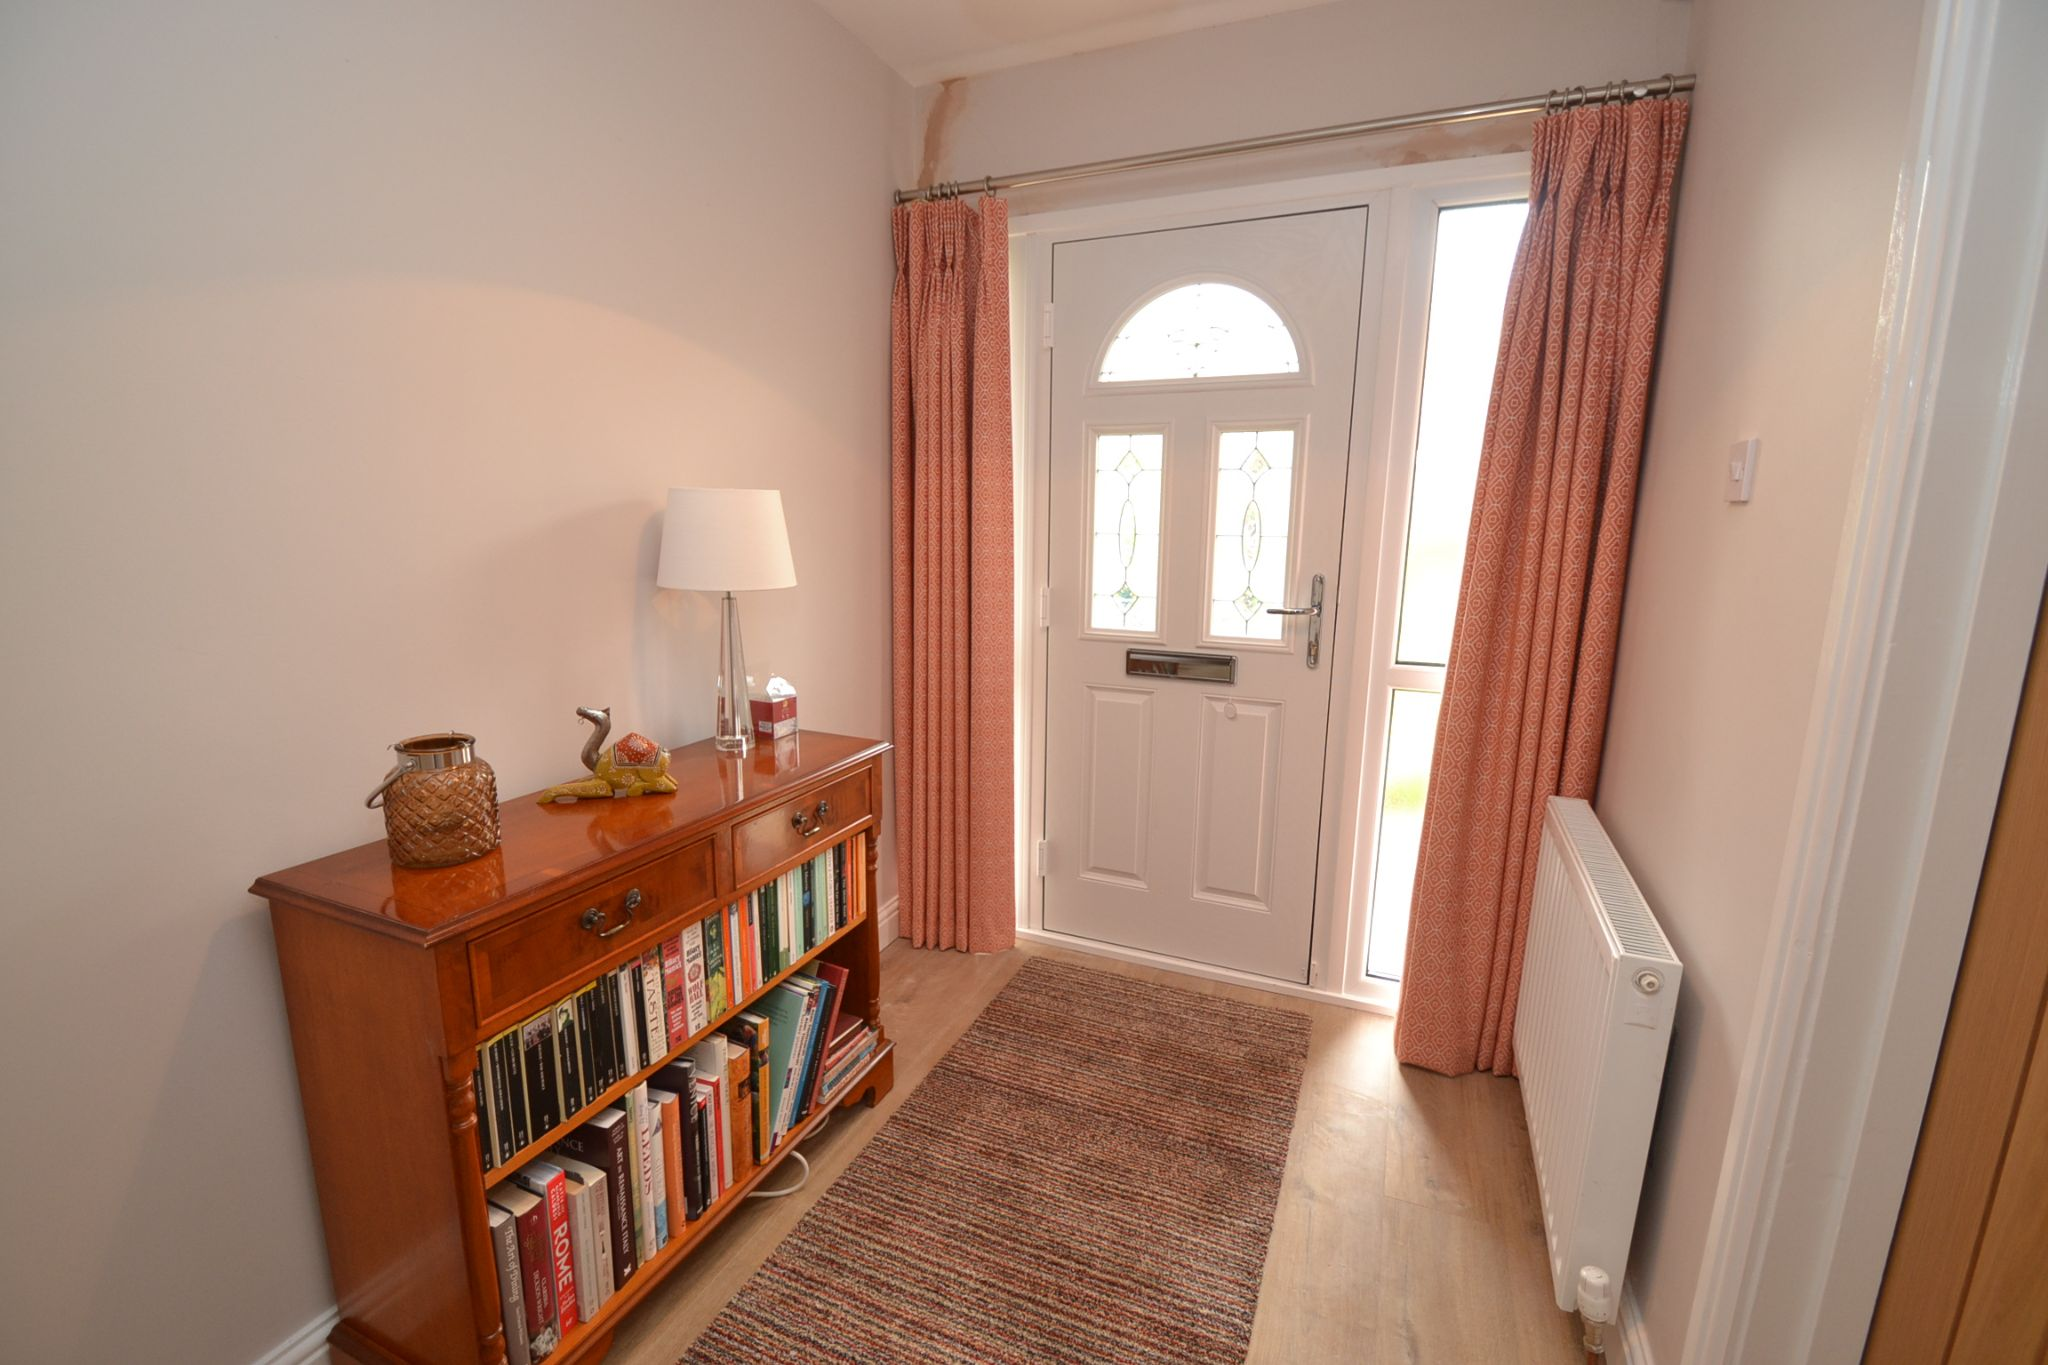 2 Bedroom Semi-detached Dormer House For Sale - Photograph 5